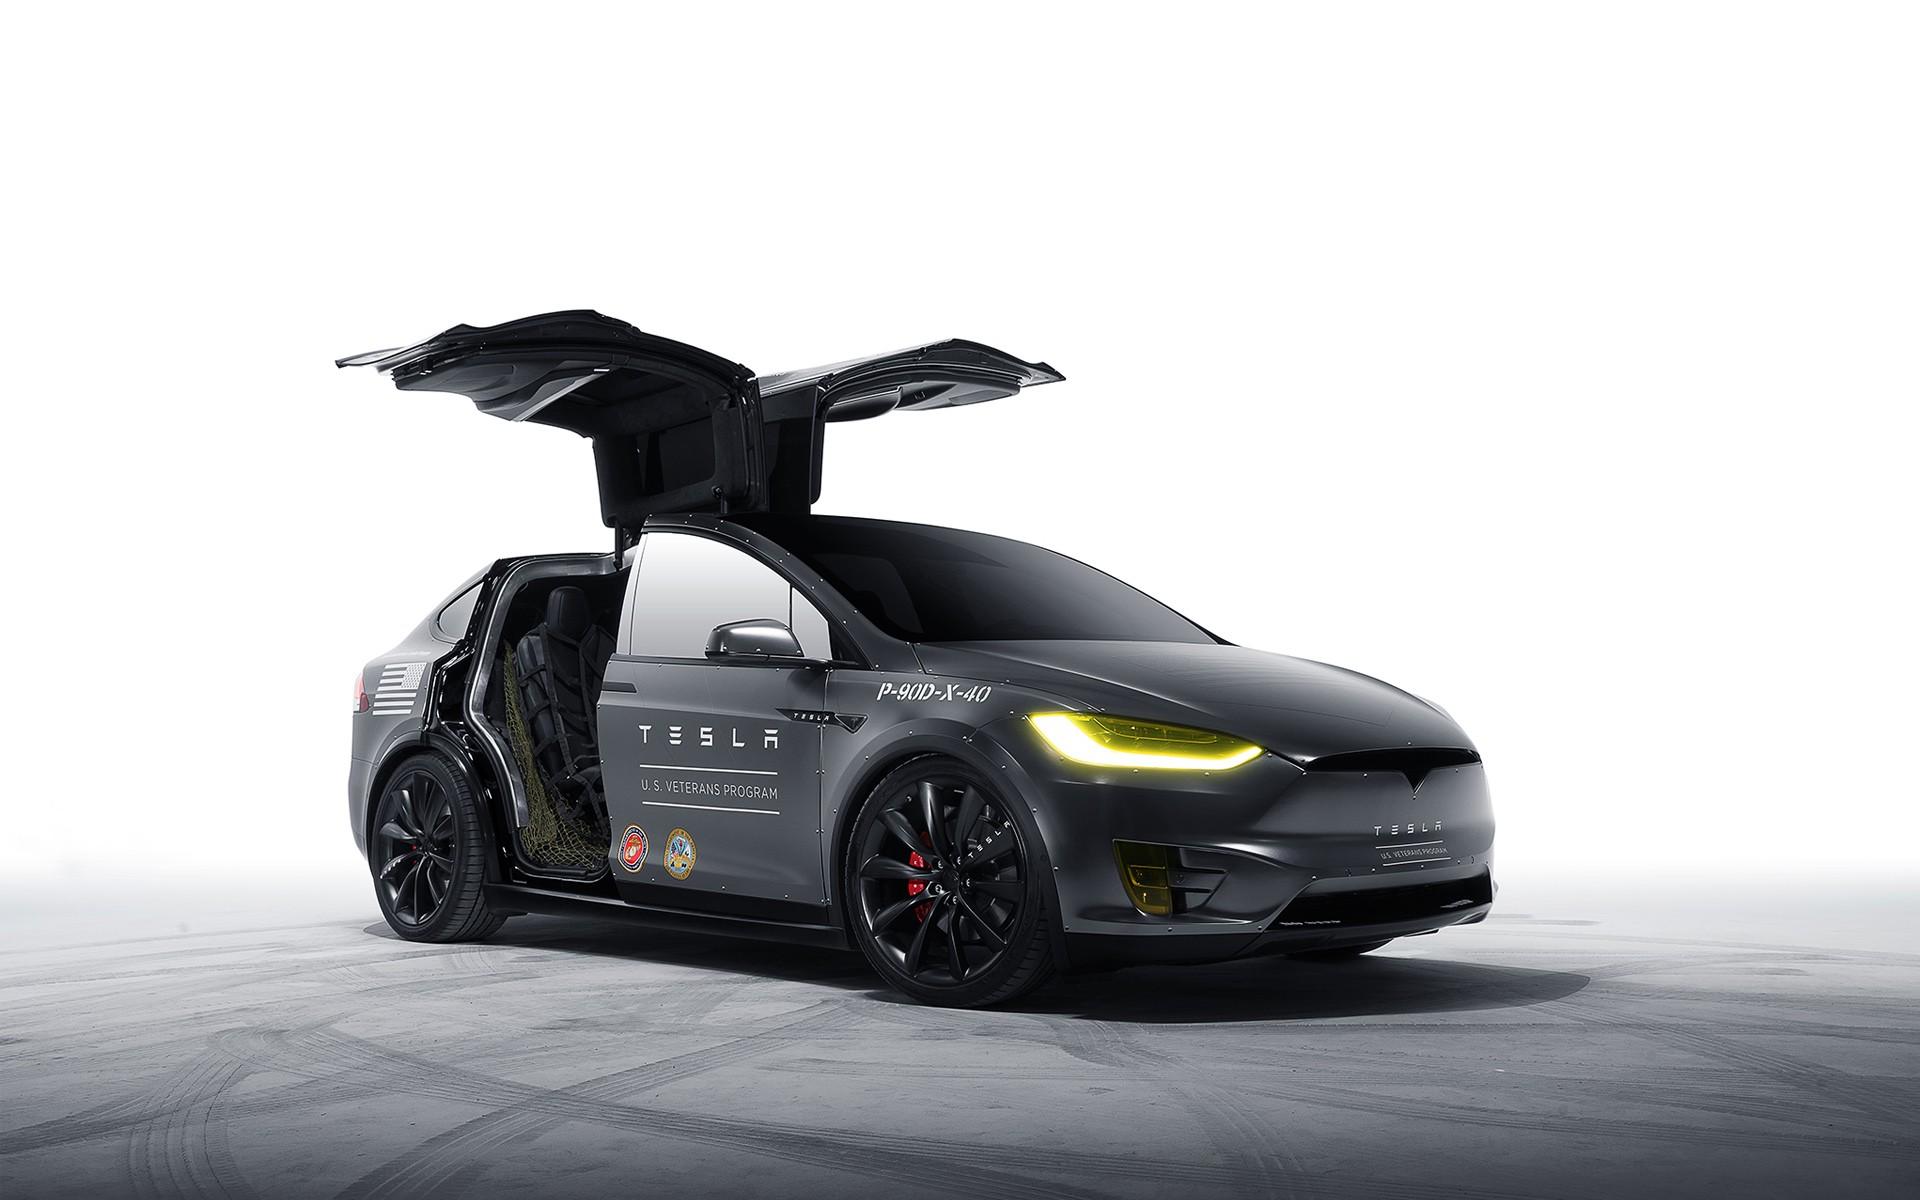 Cars Hd Wallpapers 1080p For Pc Bmw Model X Tesla Motors Wallpaper Hd Car Wallpapers Id 5976